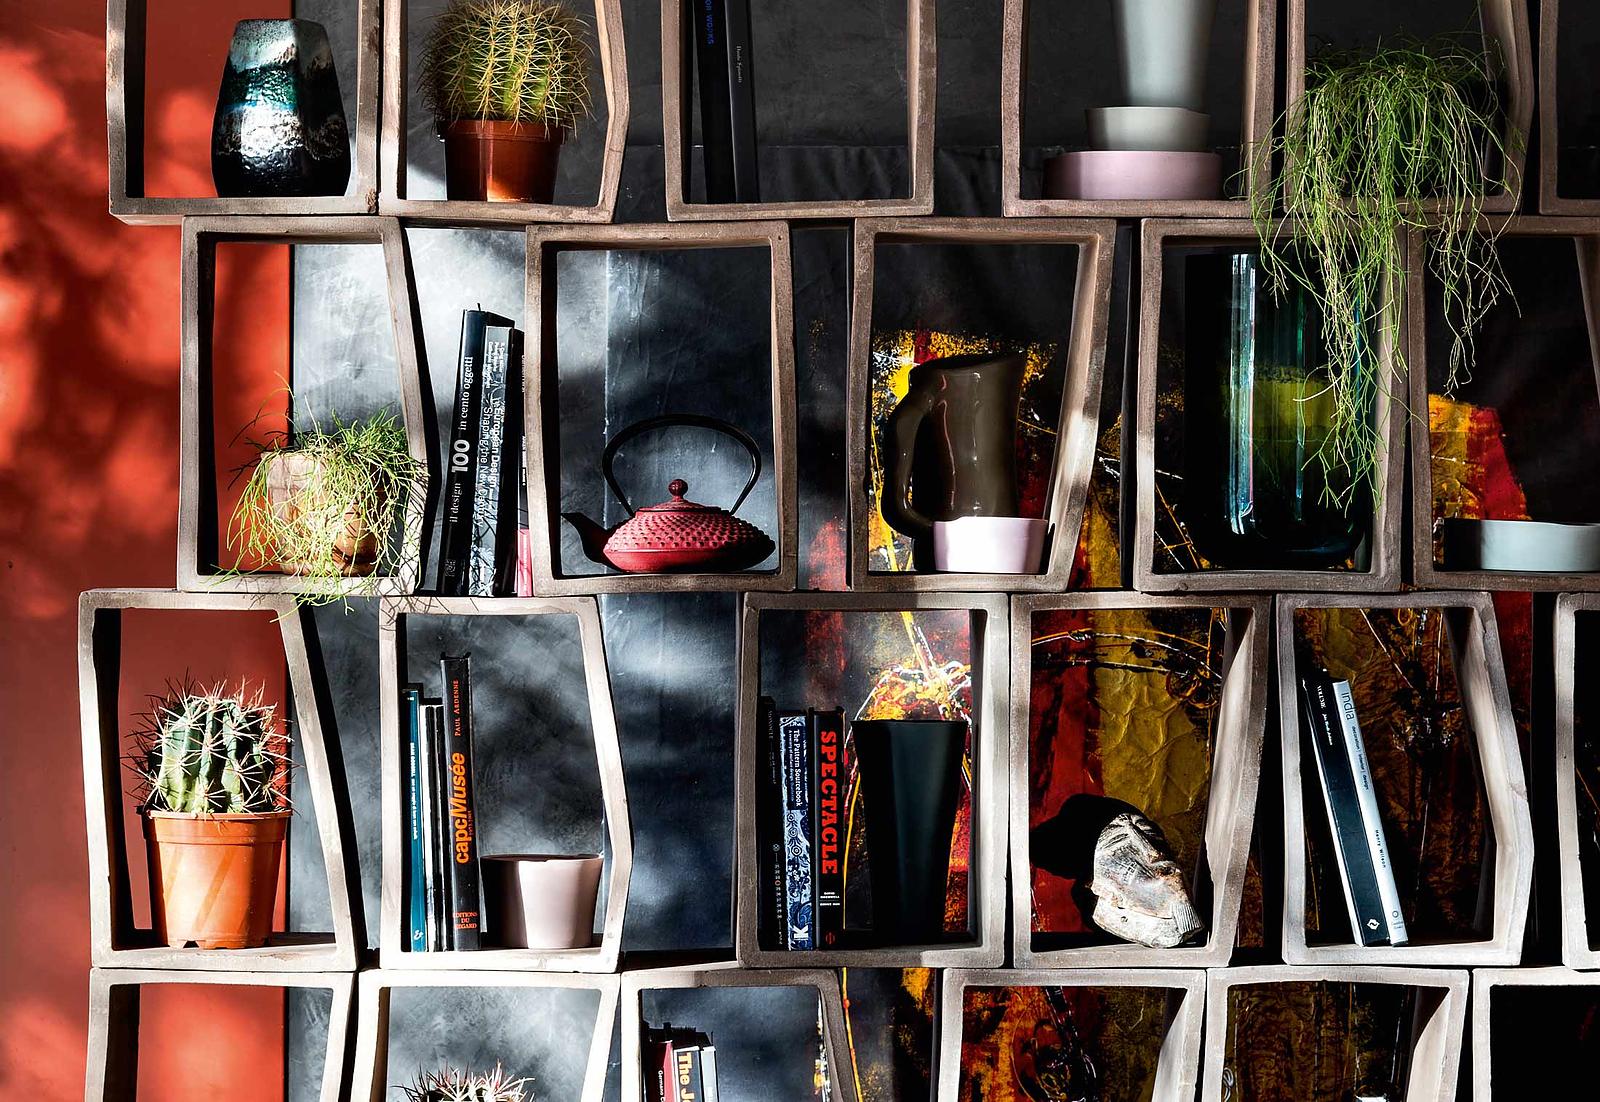 Terreria Modular Bookcase by Moroso.